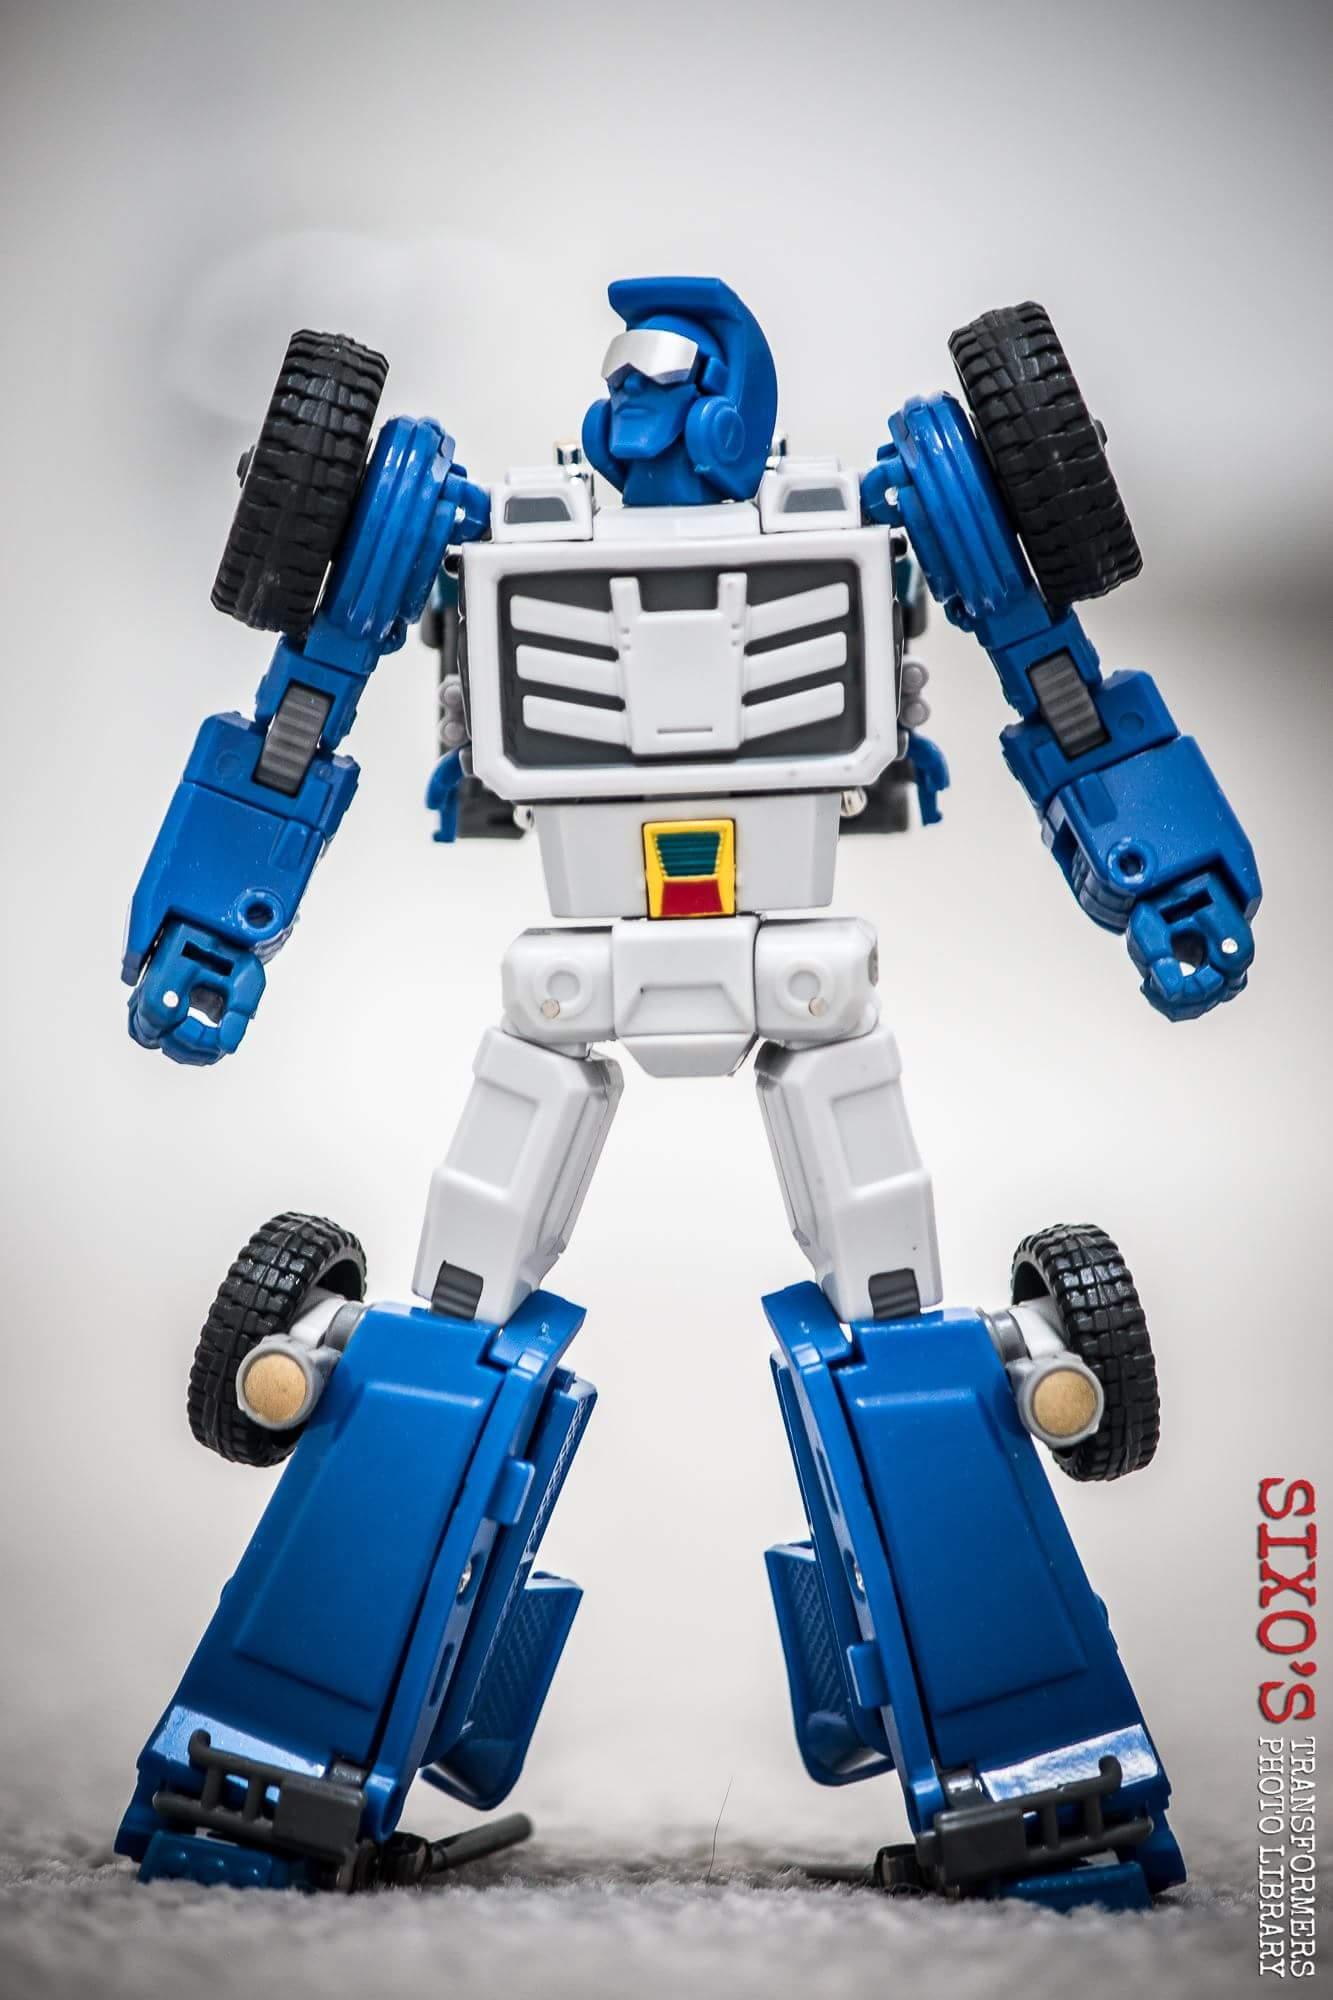 [X-Transbots] Produit Tiers - Minibots MP - Gamme MM - Page 6 Zm0pQ2G4